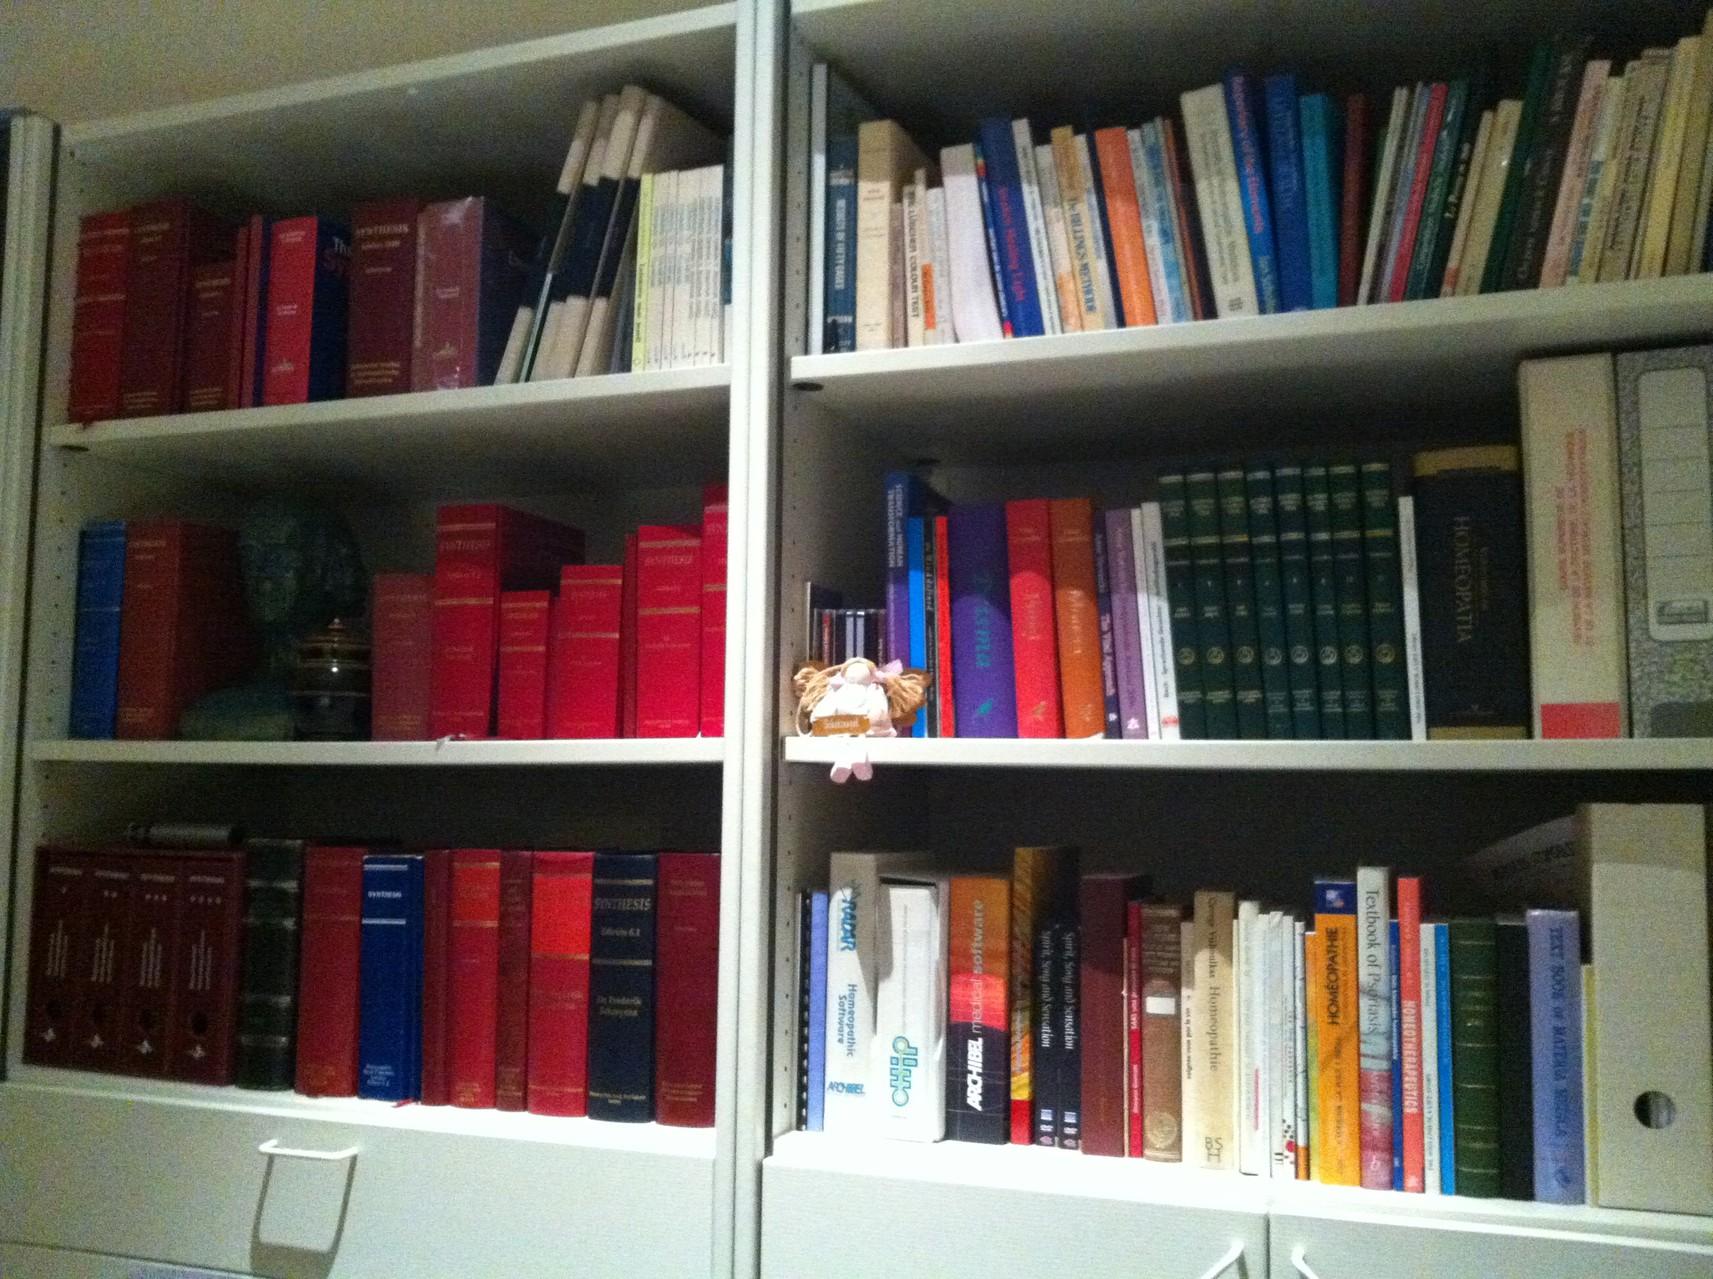 Schroyen博士の診療所の本棚。半分が自著のSynthethis